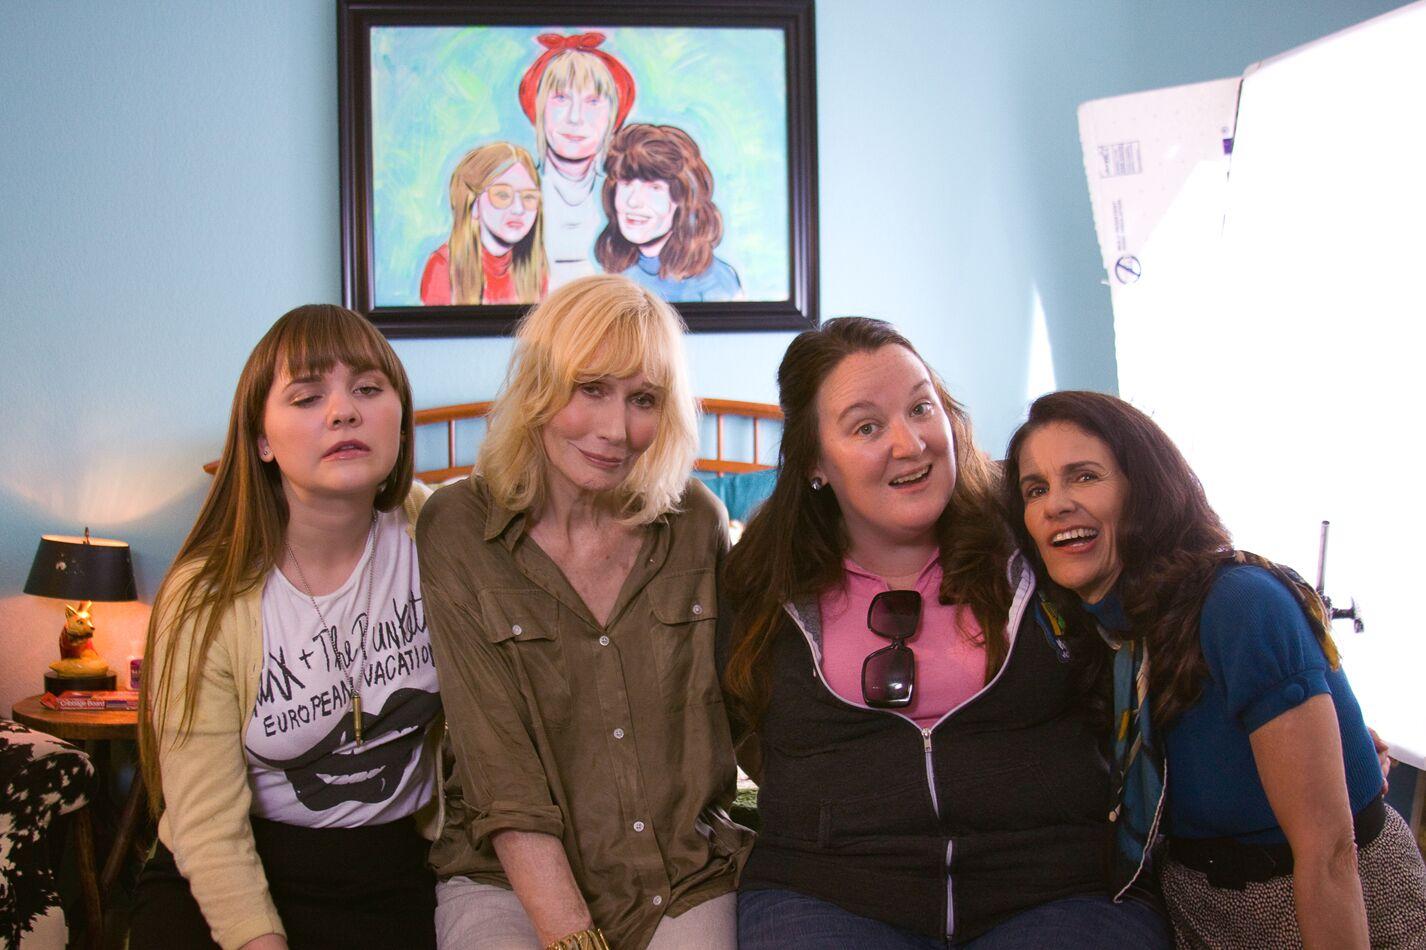 Thumbnail_Joans Day Out_all 3 plus Ellen.jpg